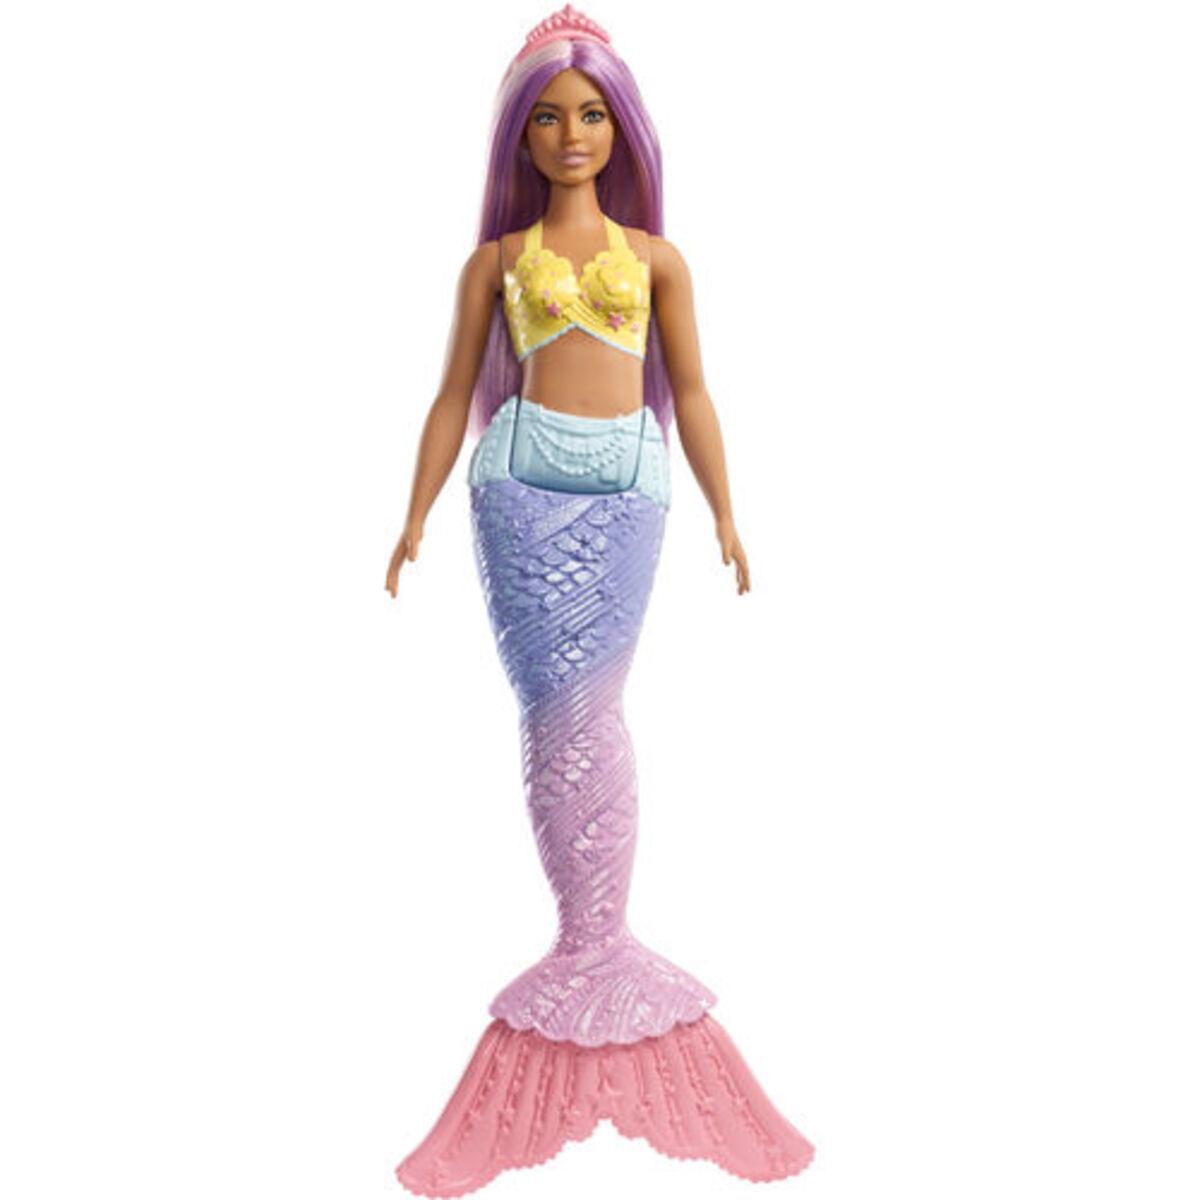 Bild 5 von Barbie Dreamtopia Meerjungfrau, lila Haare